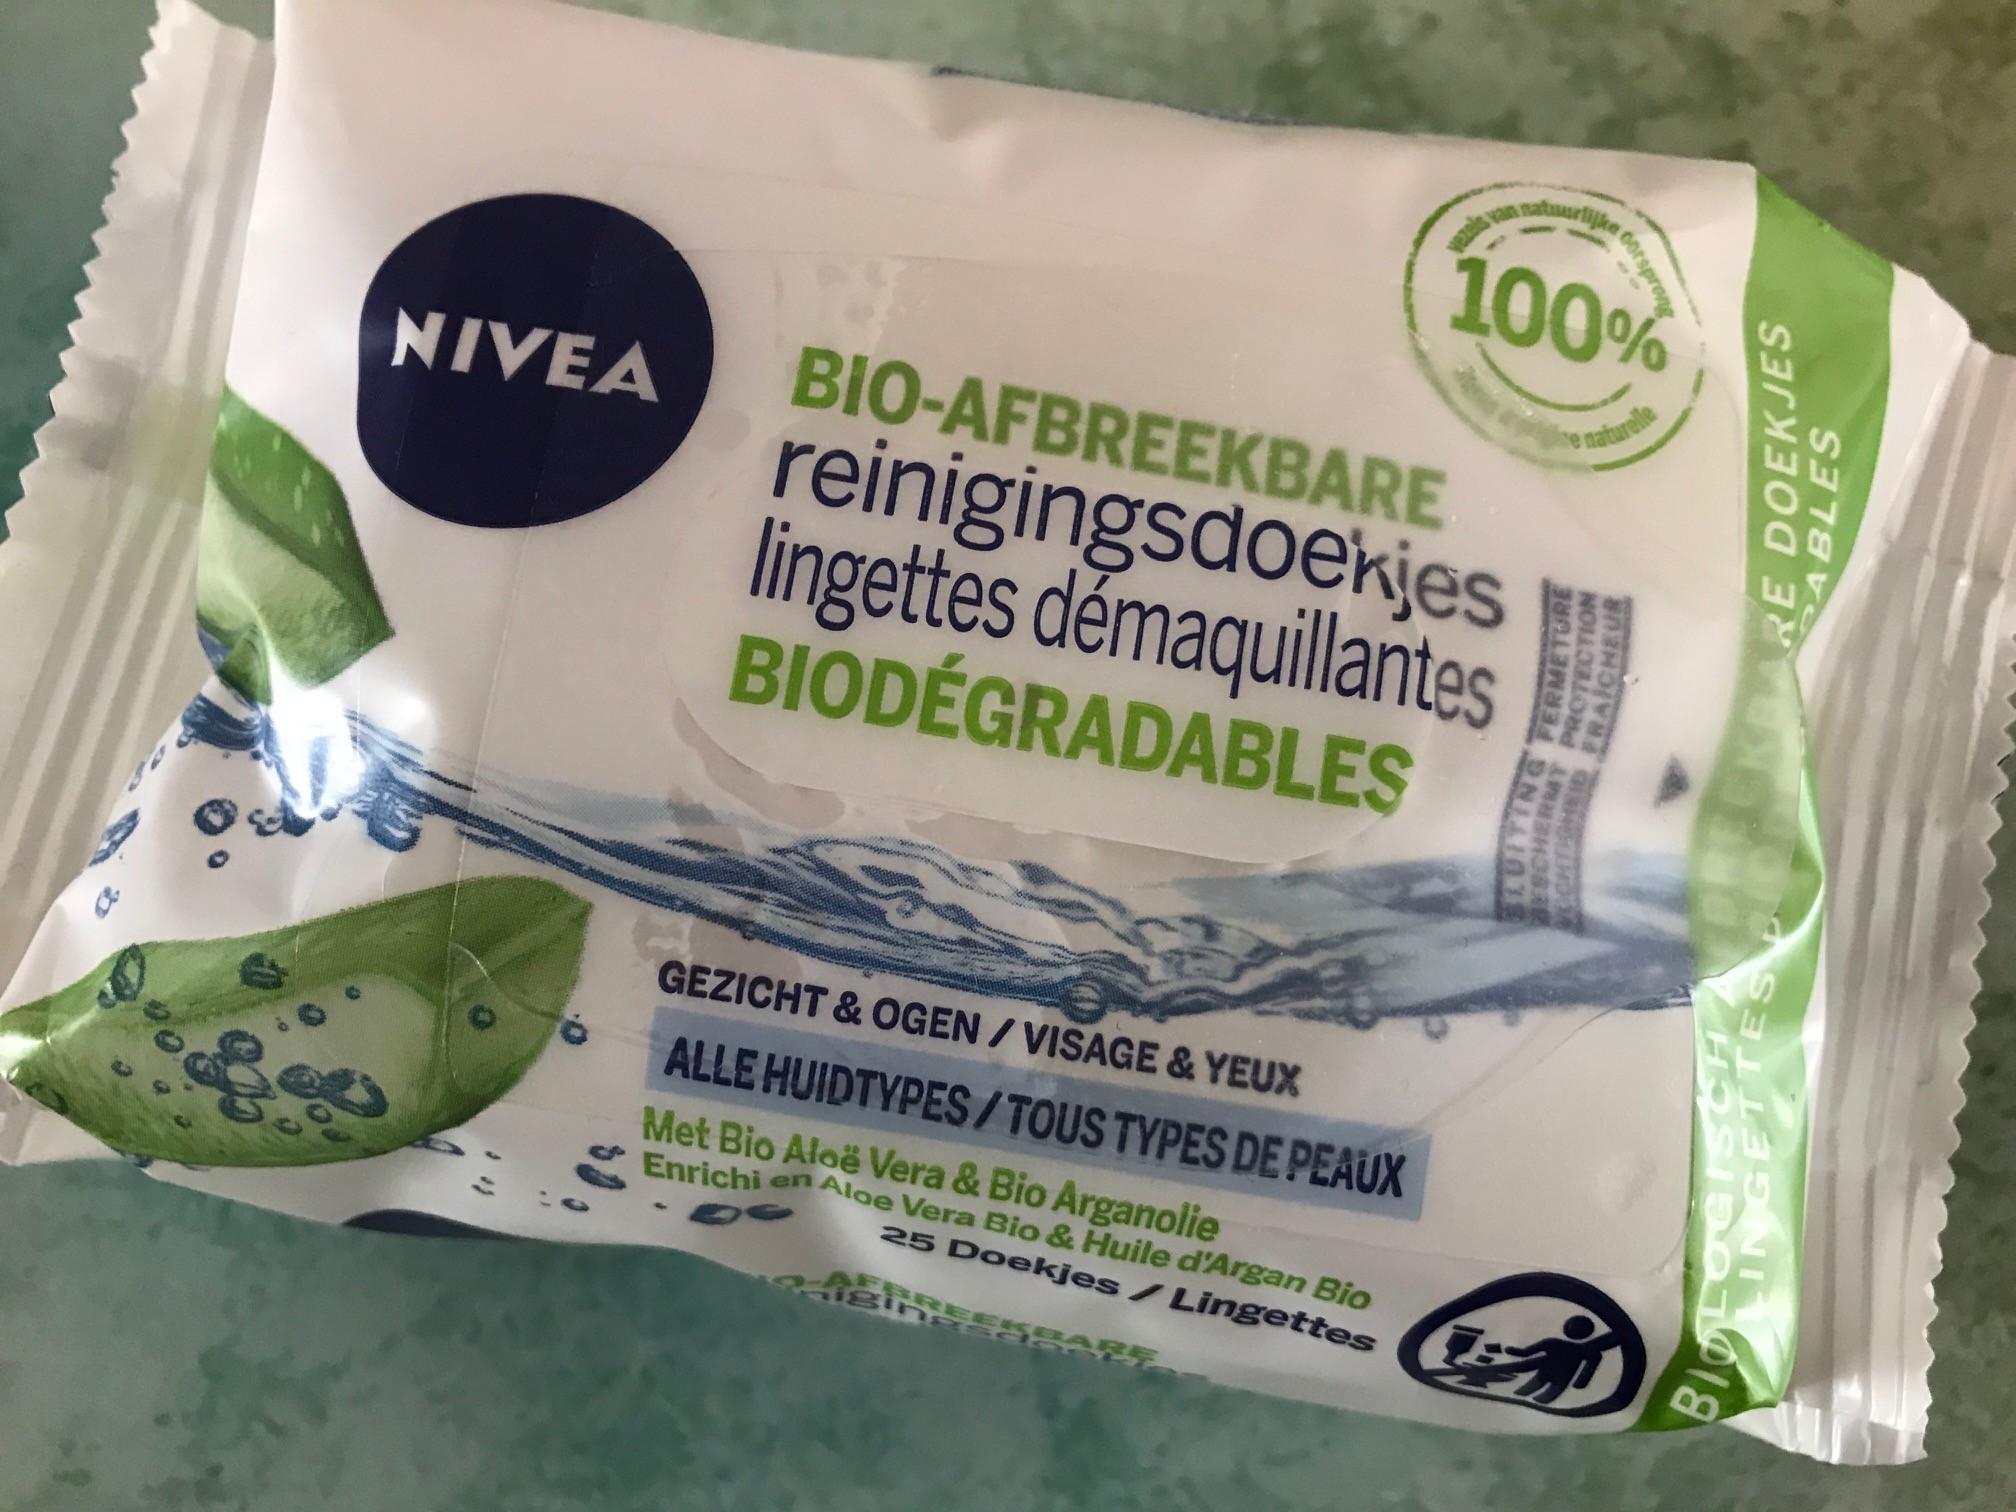 nivea biologisch afbreekbare reinigingsdoekjes